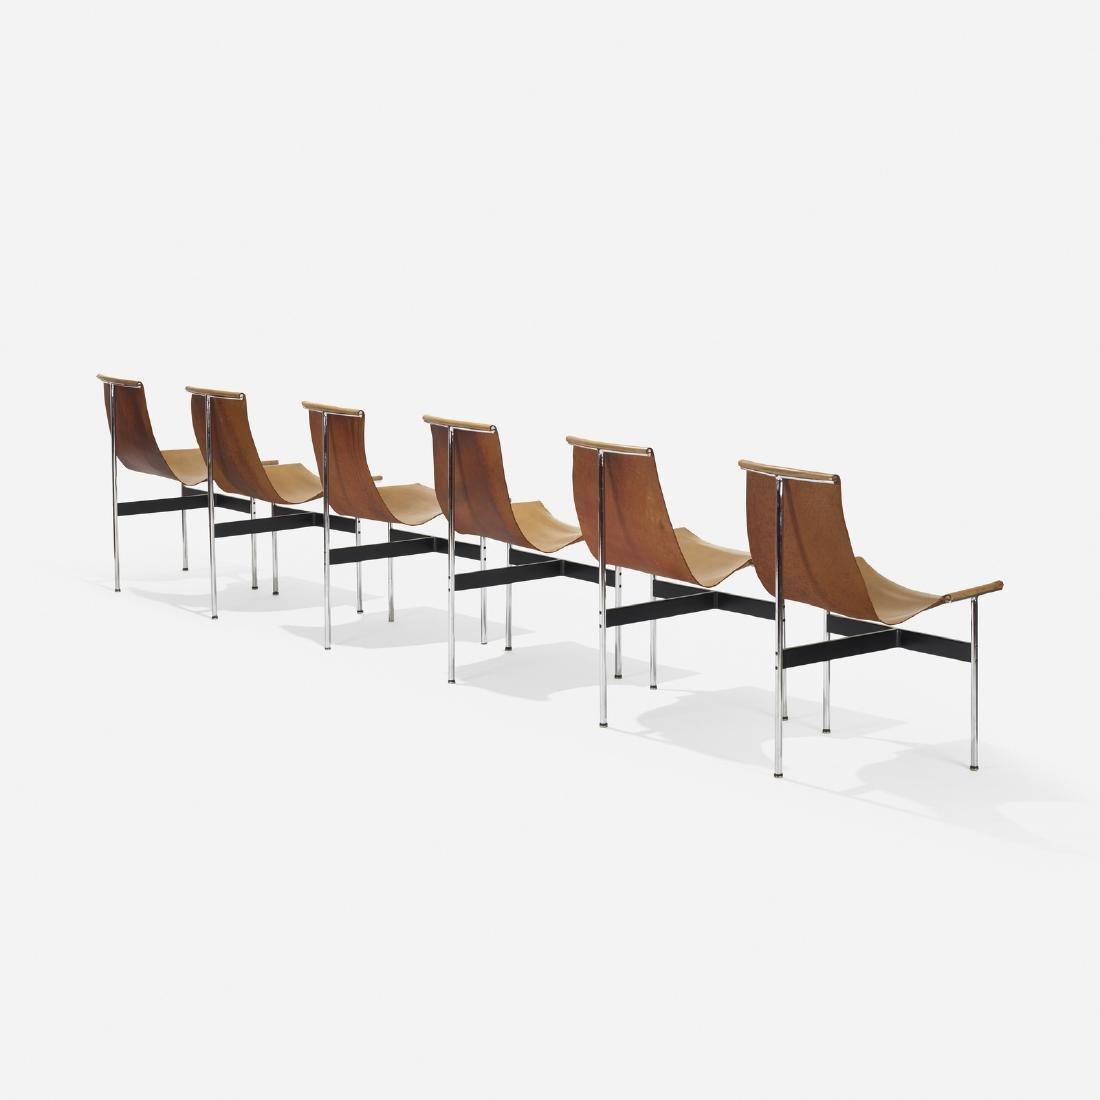 William Katavolos, Littell & Kelley, six T-chairs 3-LC